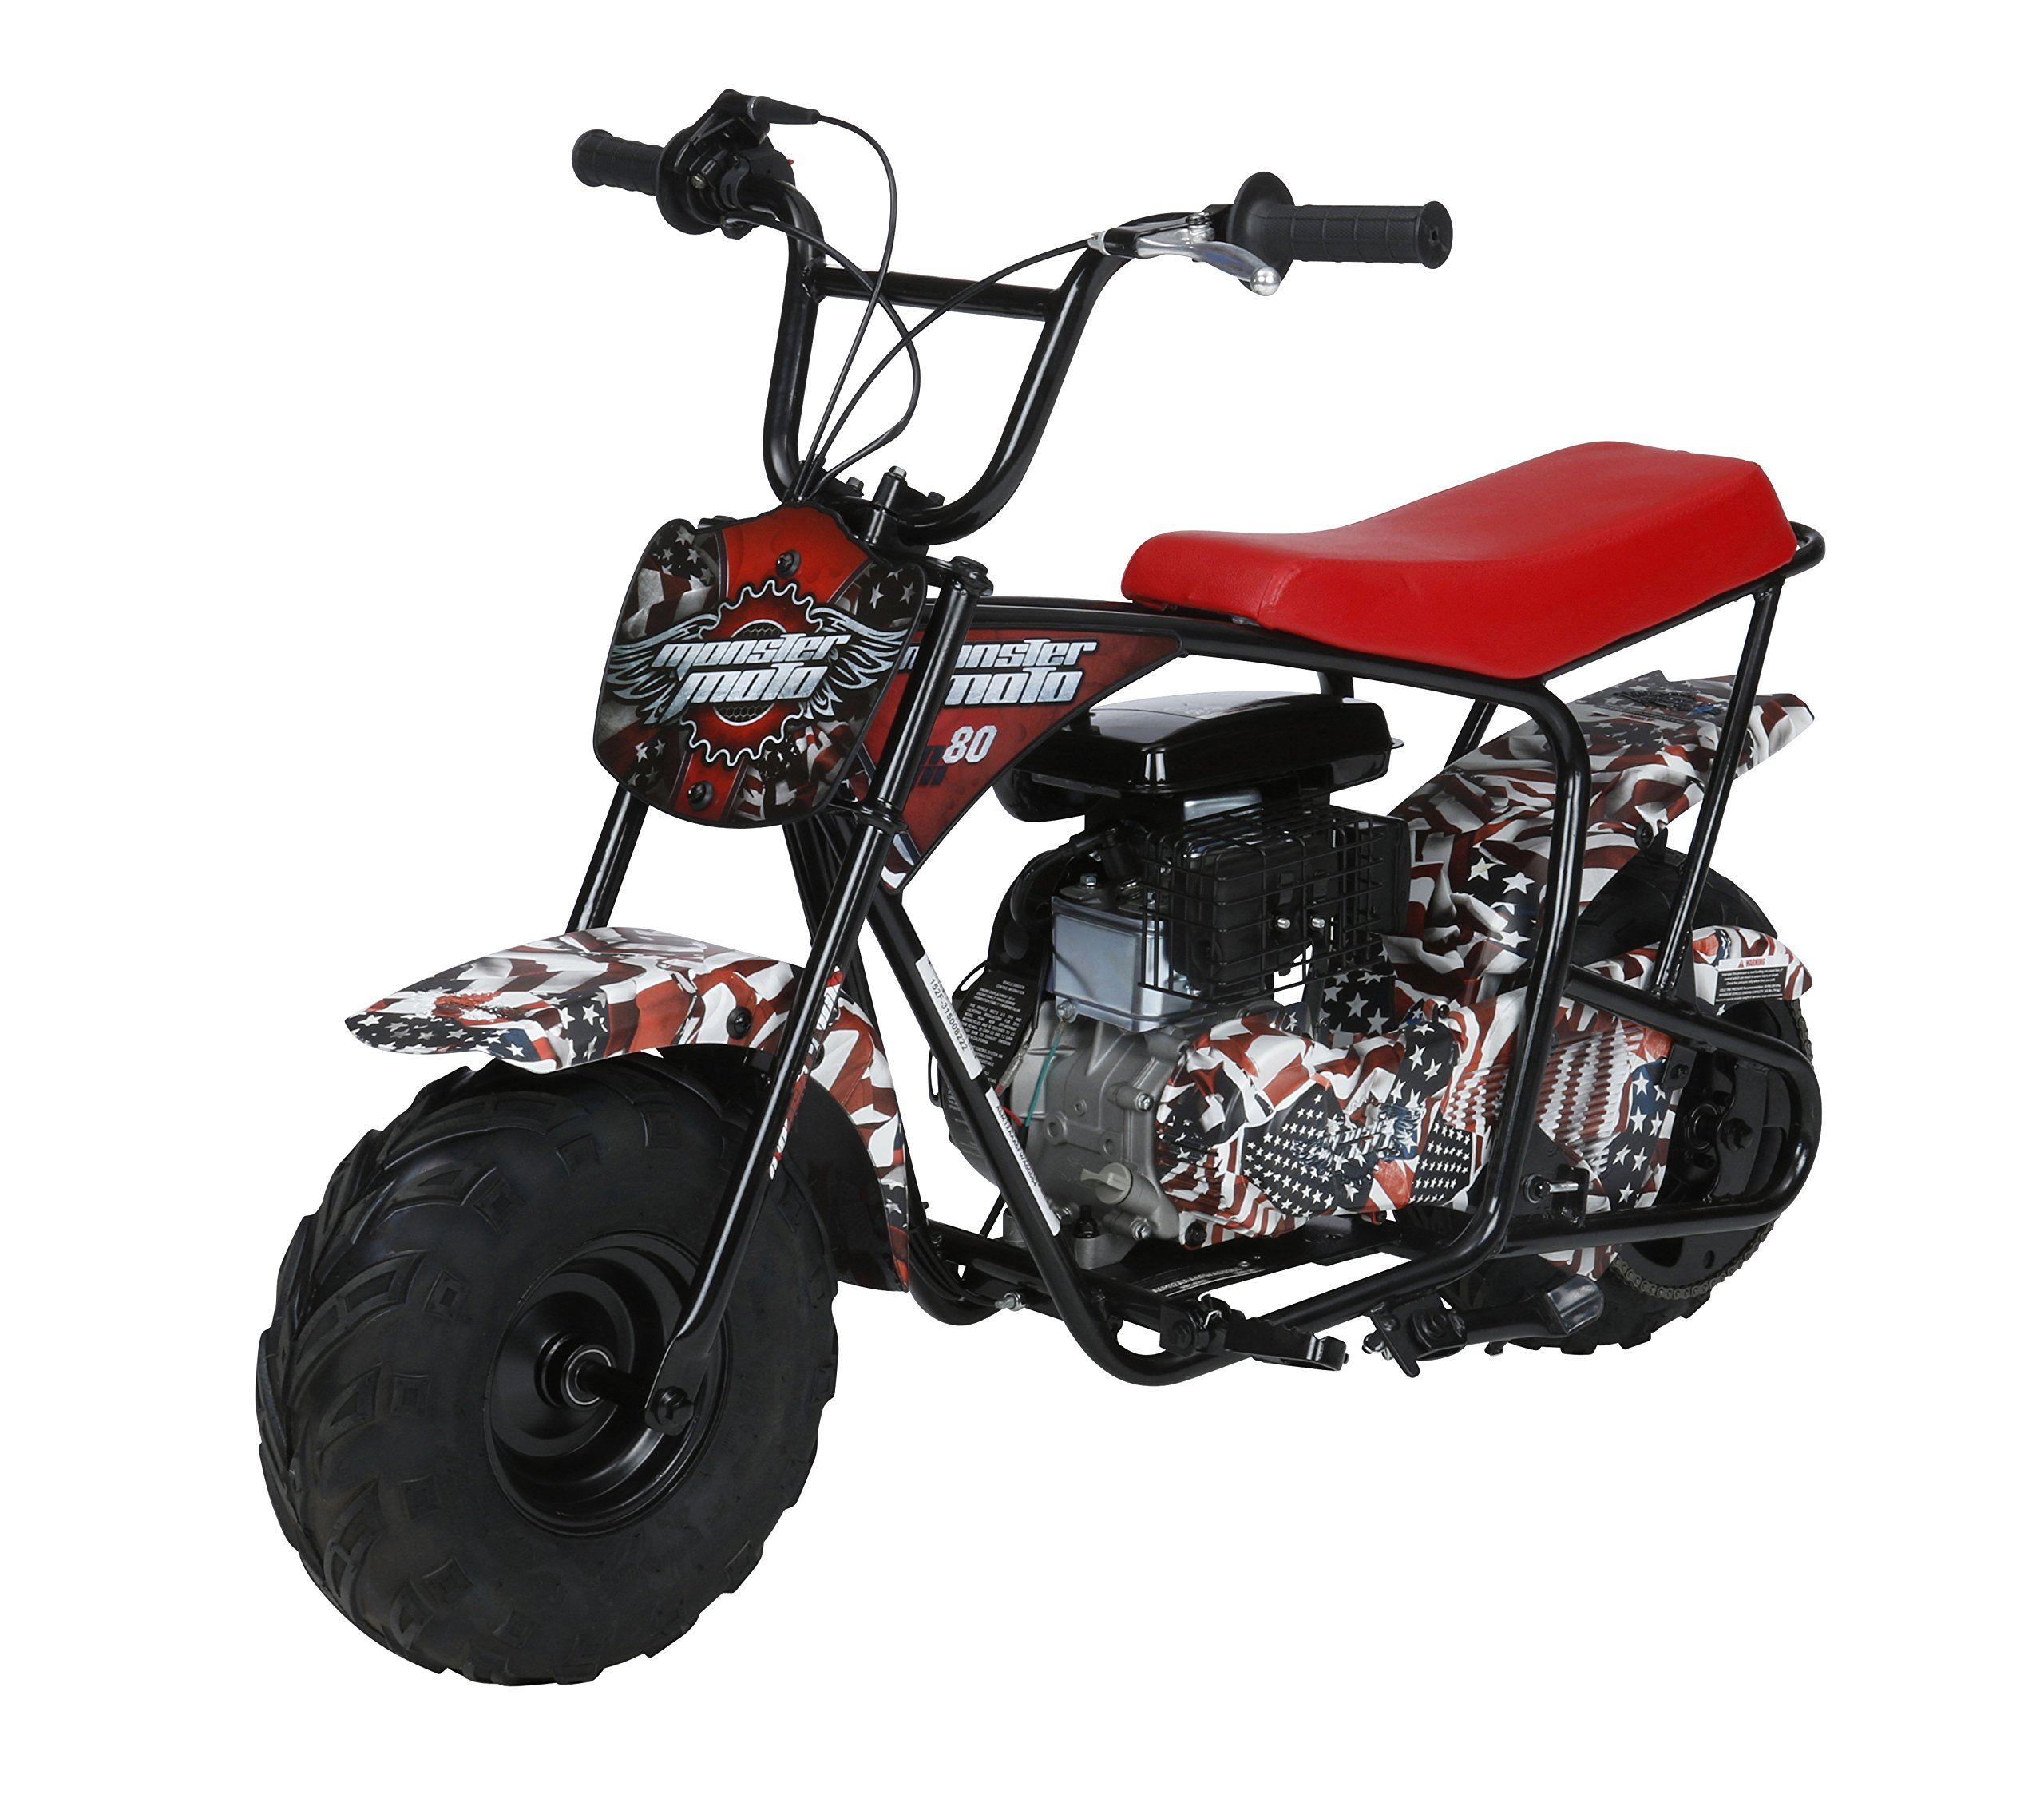 Monster Moto MM-B80-AF American Flag 80CC Youth Mini Bike - American Flag,1 Pack by Monster Moto